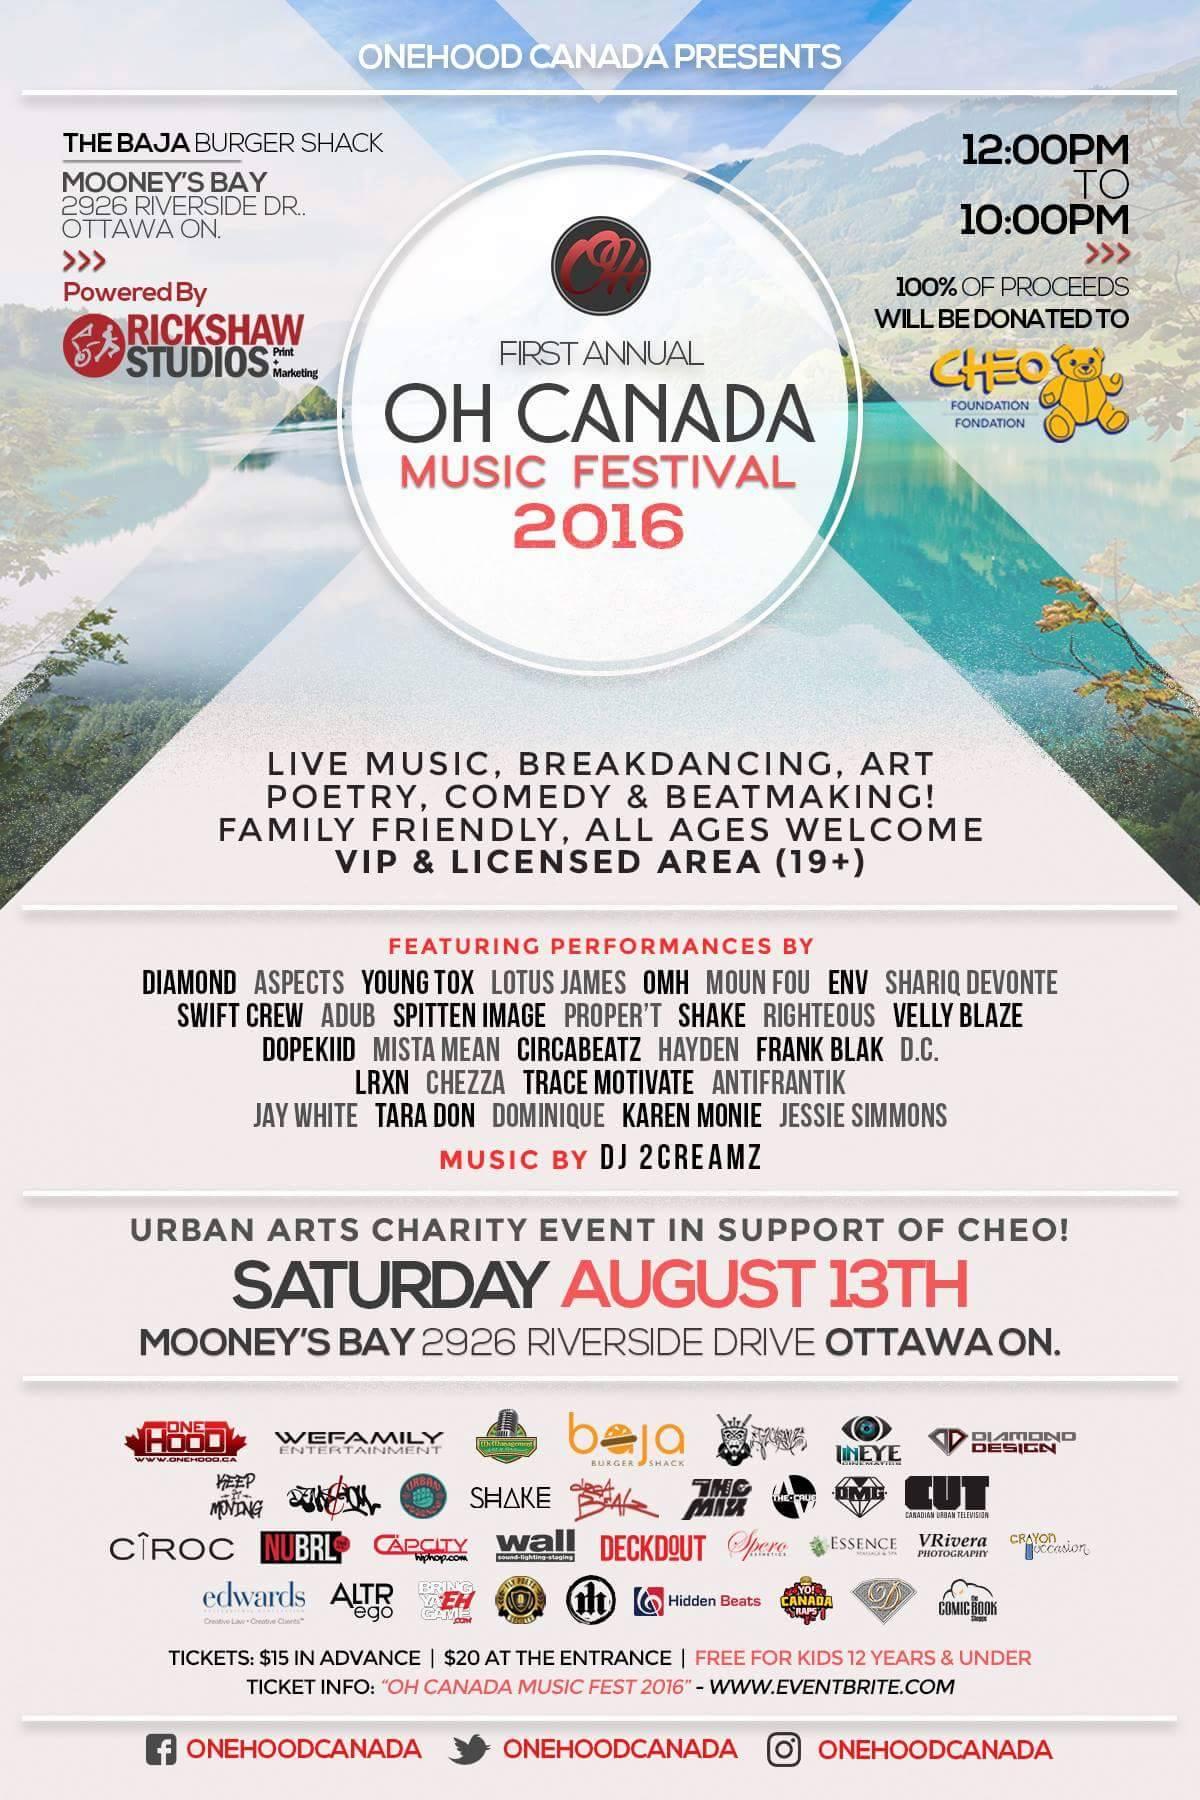 OH CANADA MUSIC & ARTS FESTIVAL